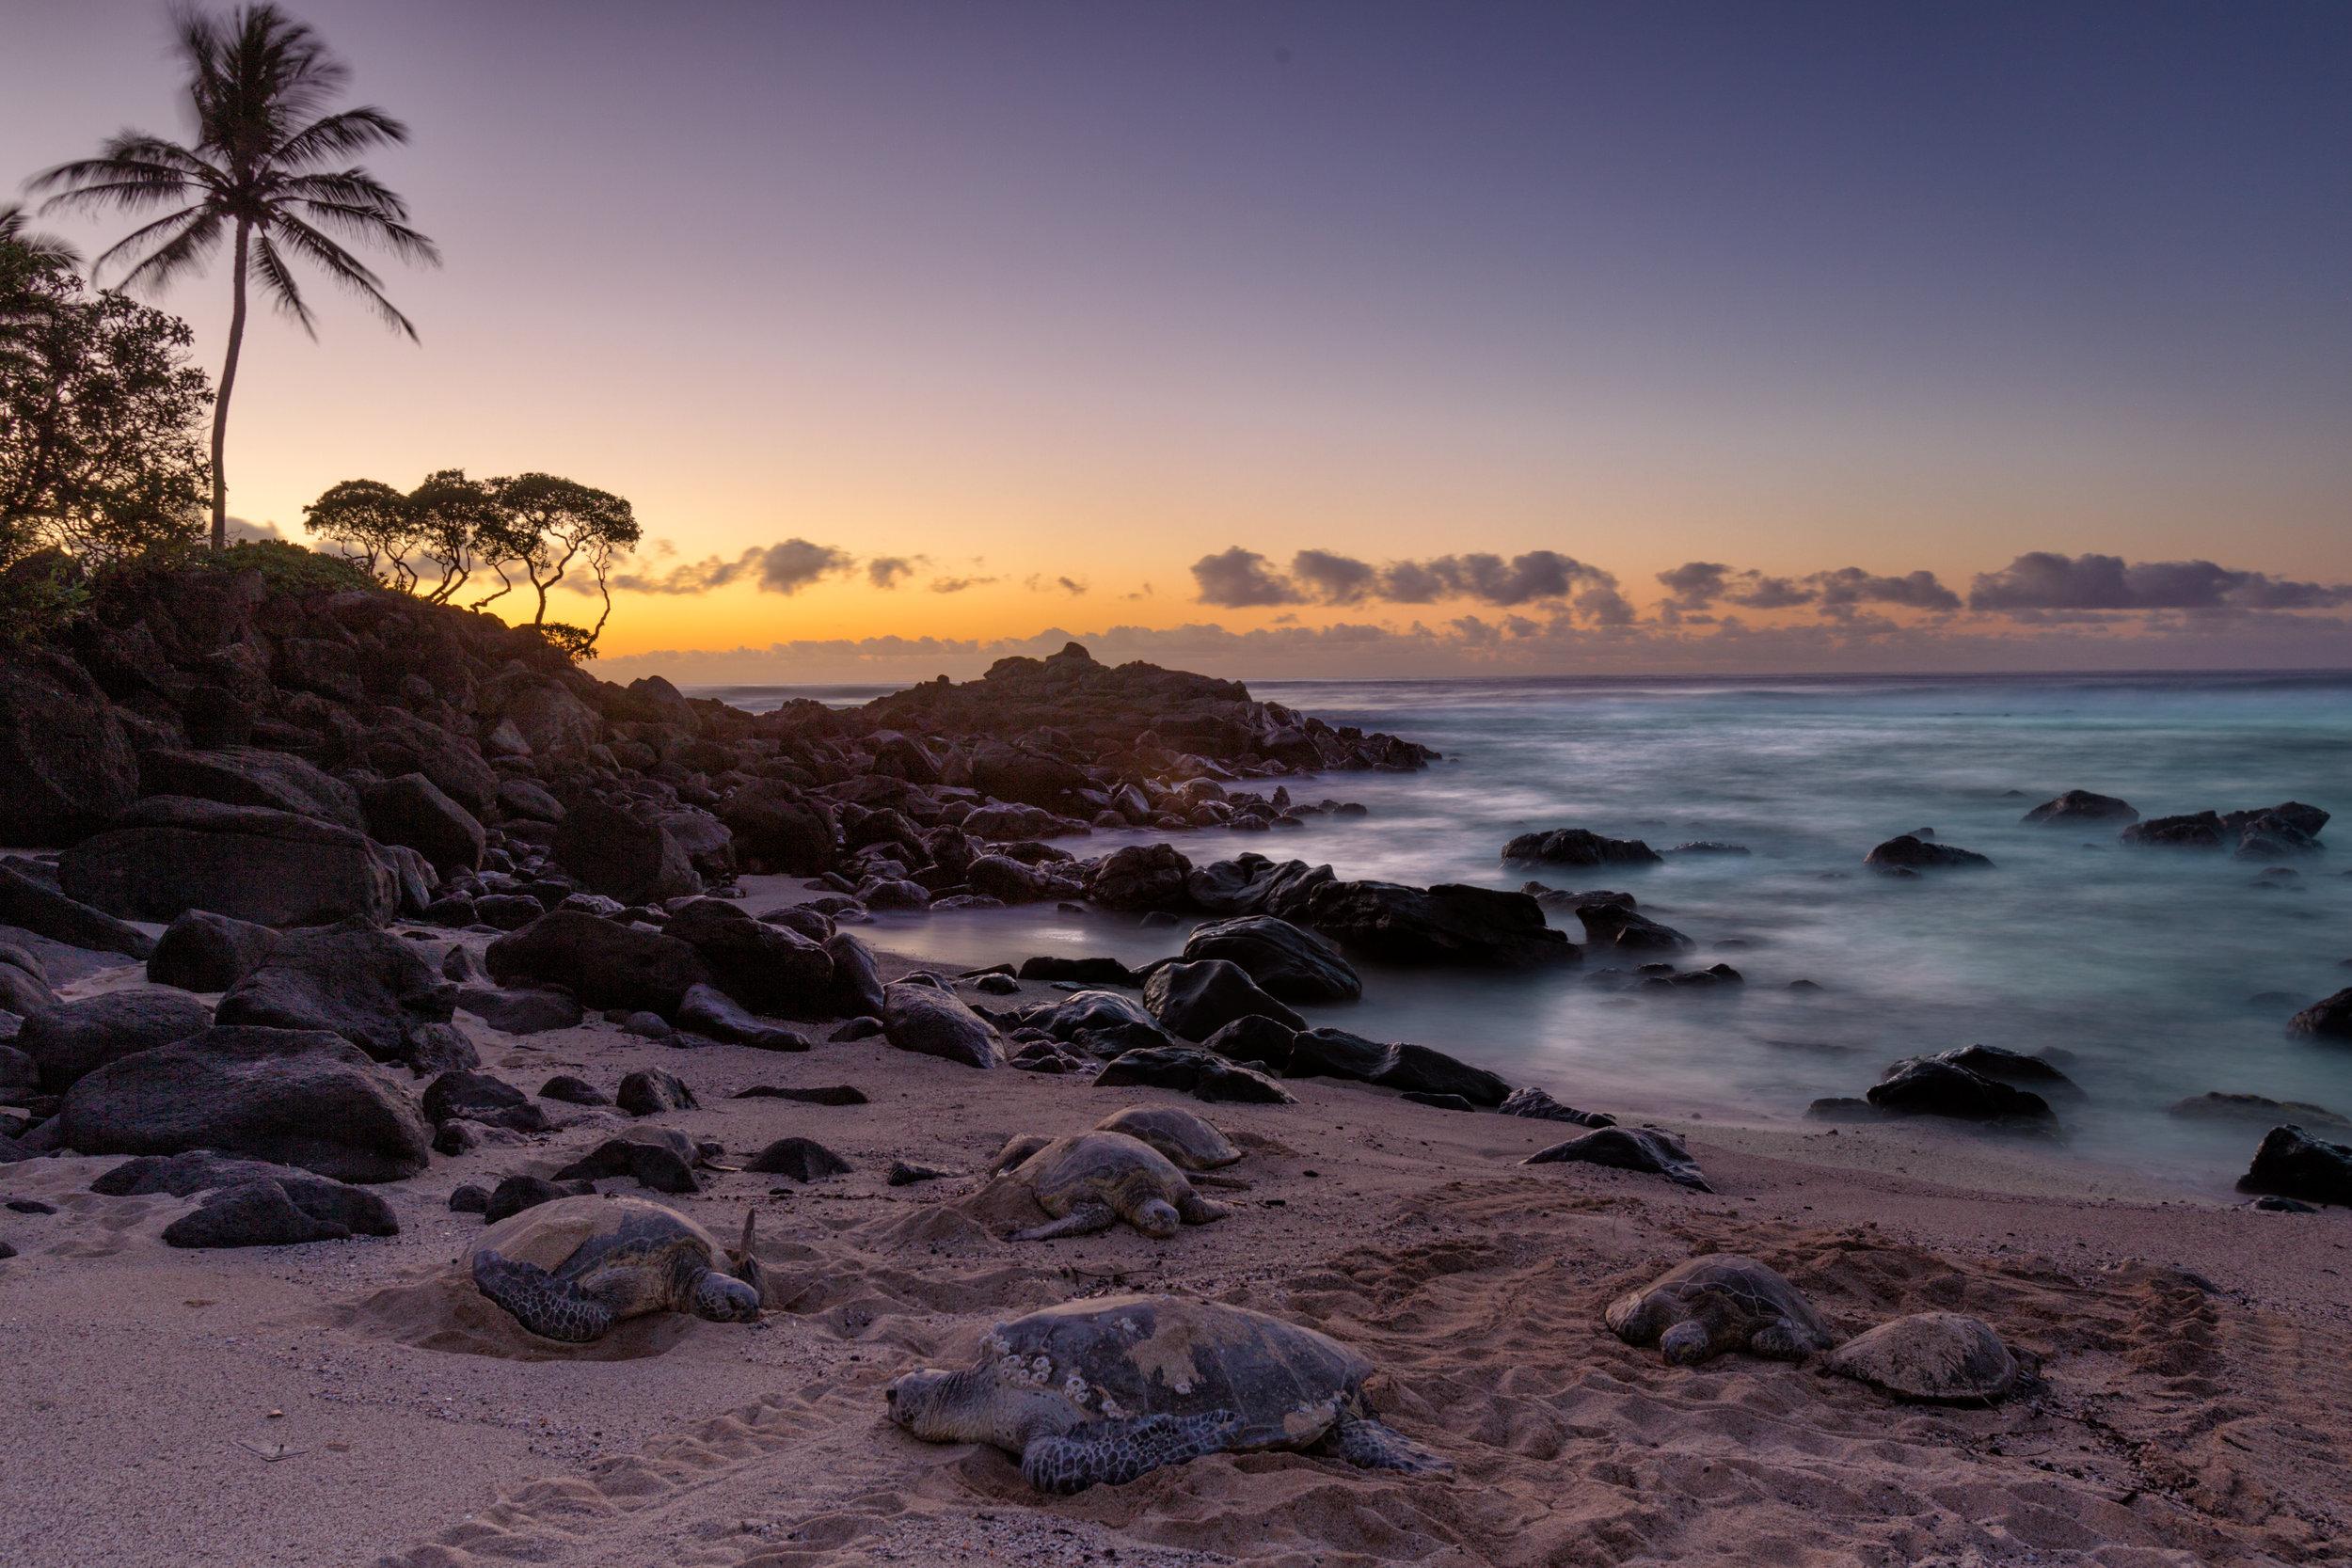 Palm-Tree-Turtle-Sunset.jpg